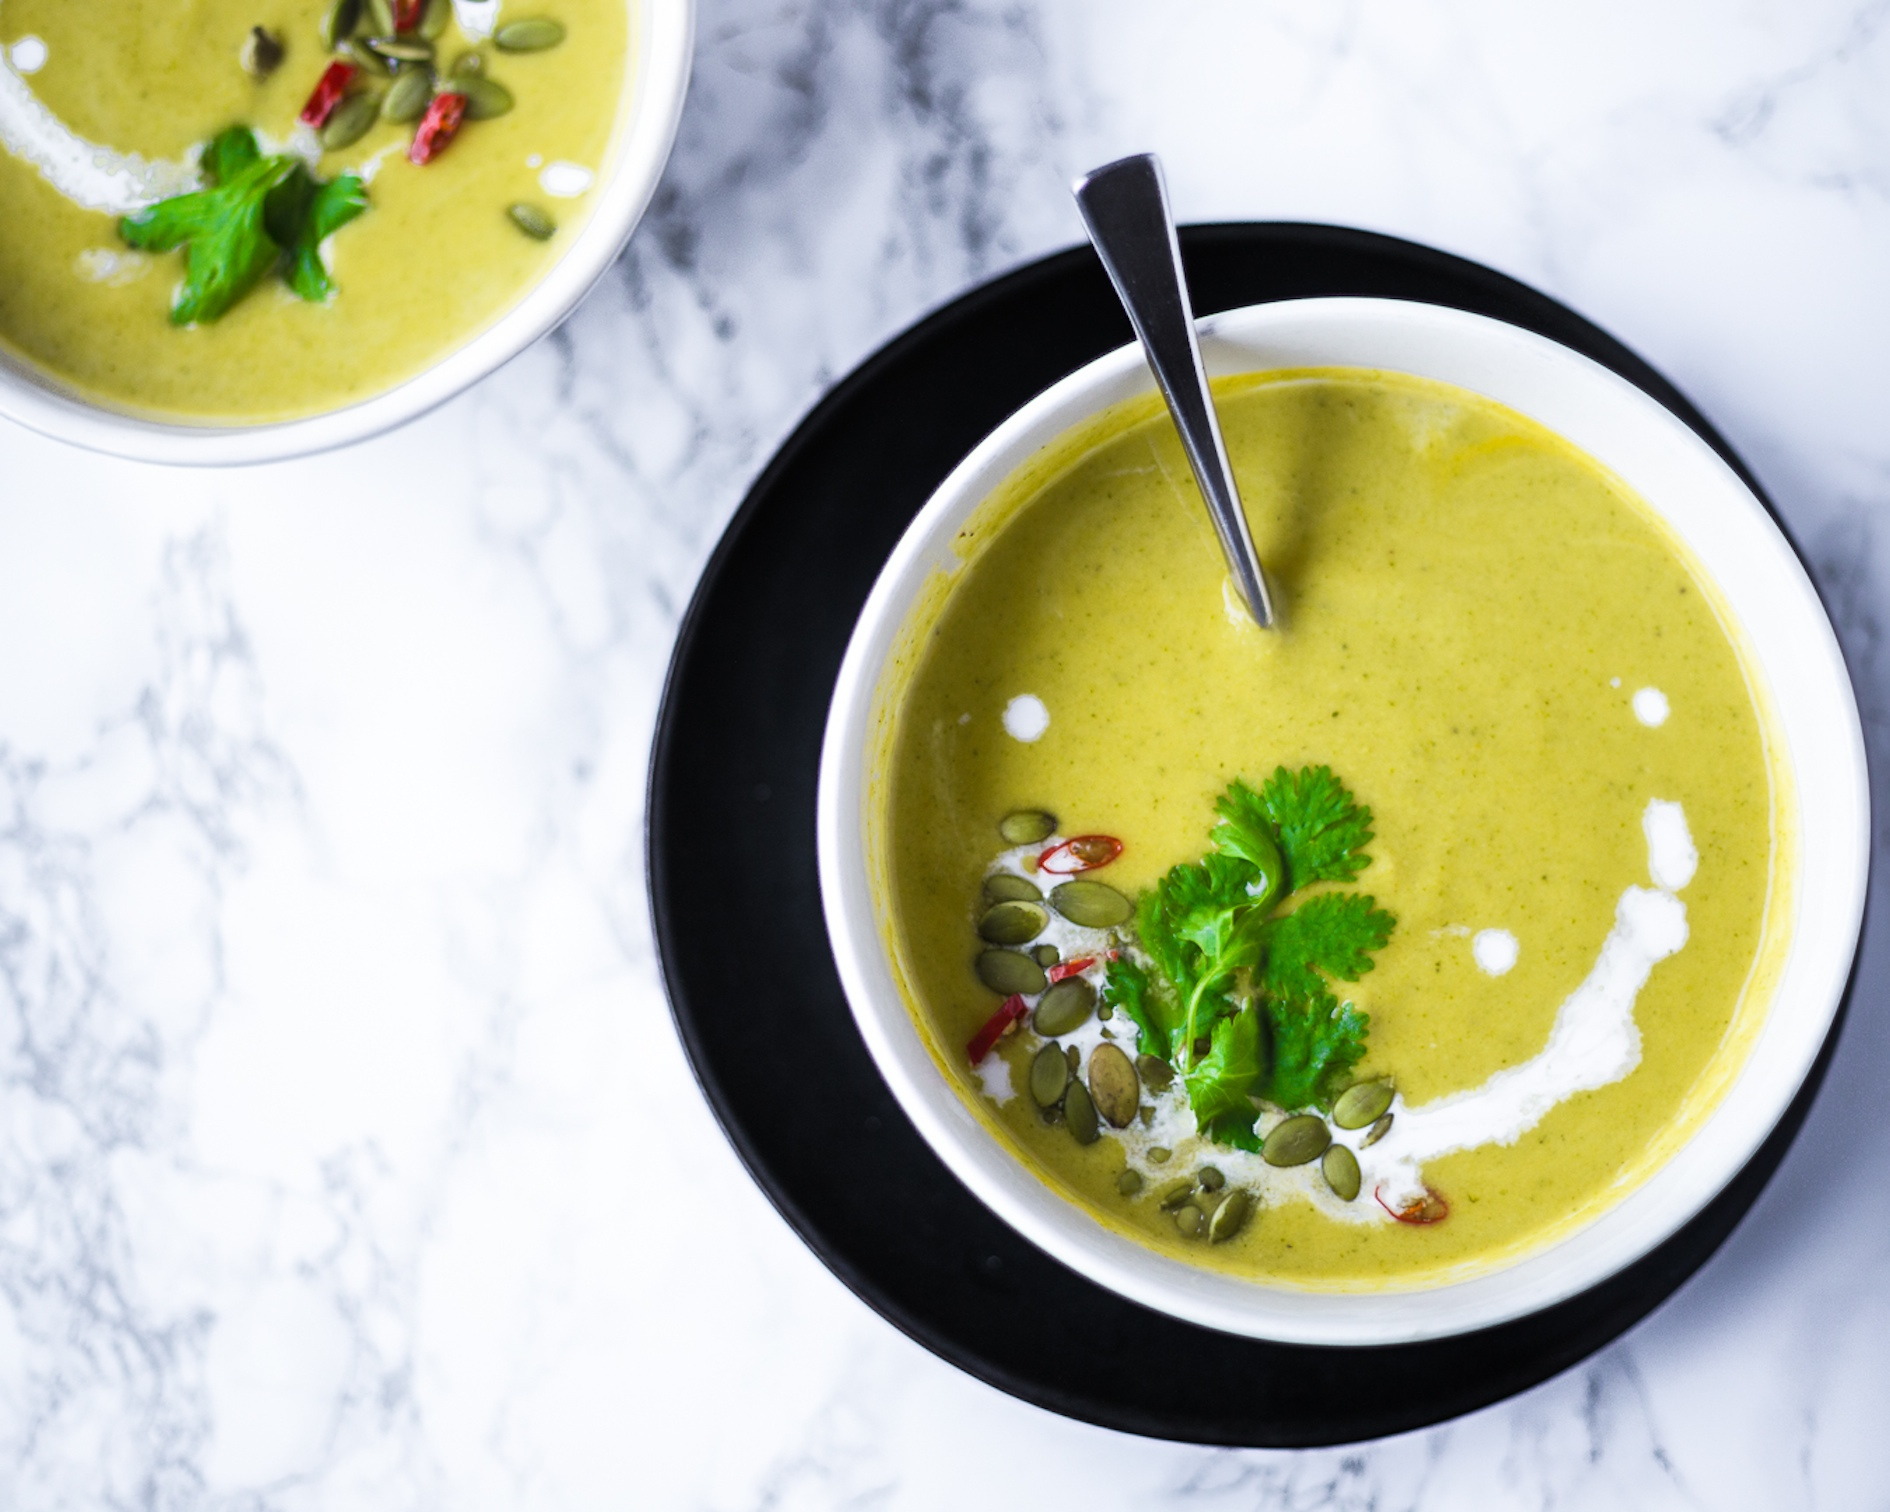 {Guest Post//Recipe} The Soup'er Bowl: Creamy Coconut Broccoli Edition